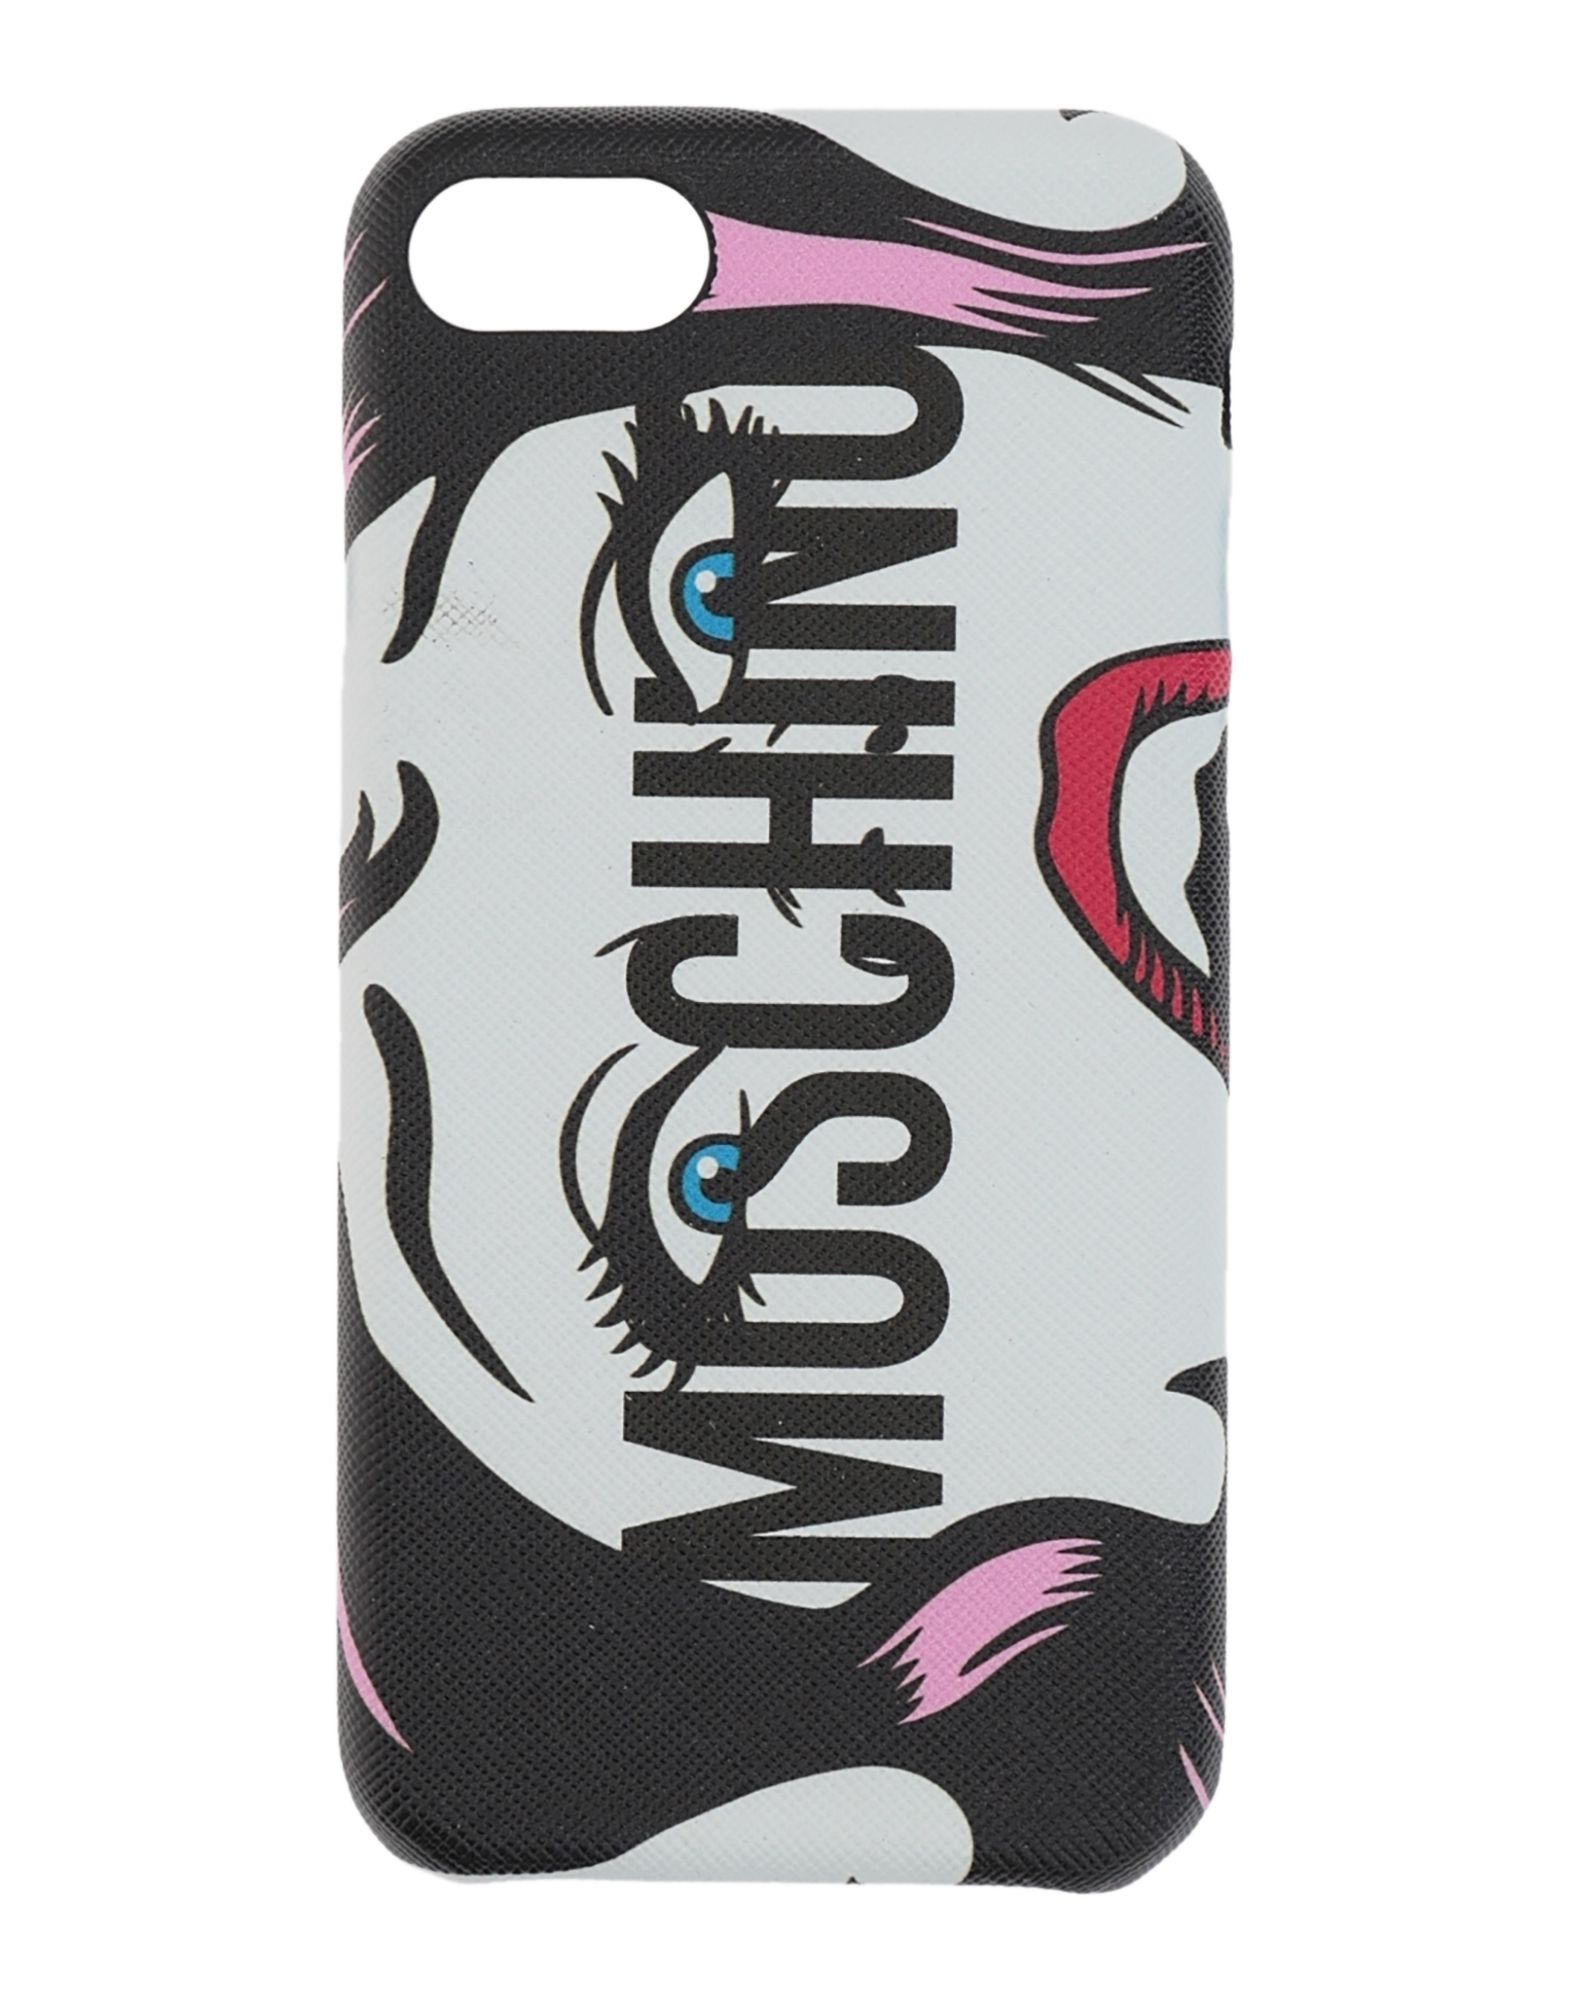 Фото - MOSCHINO Чехол чехол для сотового телефона nillkin samsung a8 2018 чехол книжка sparkle розовый